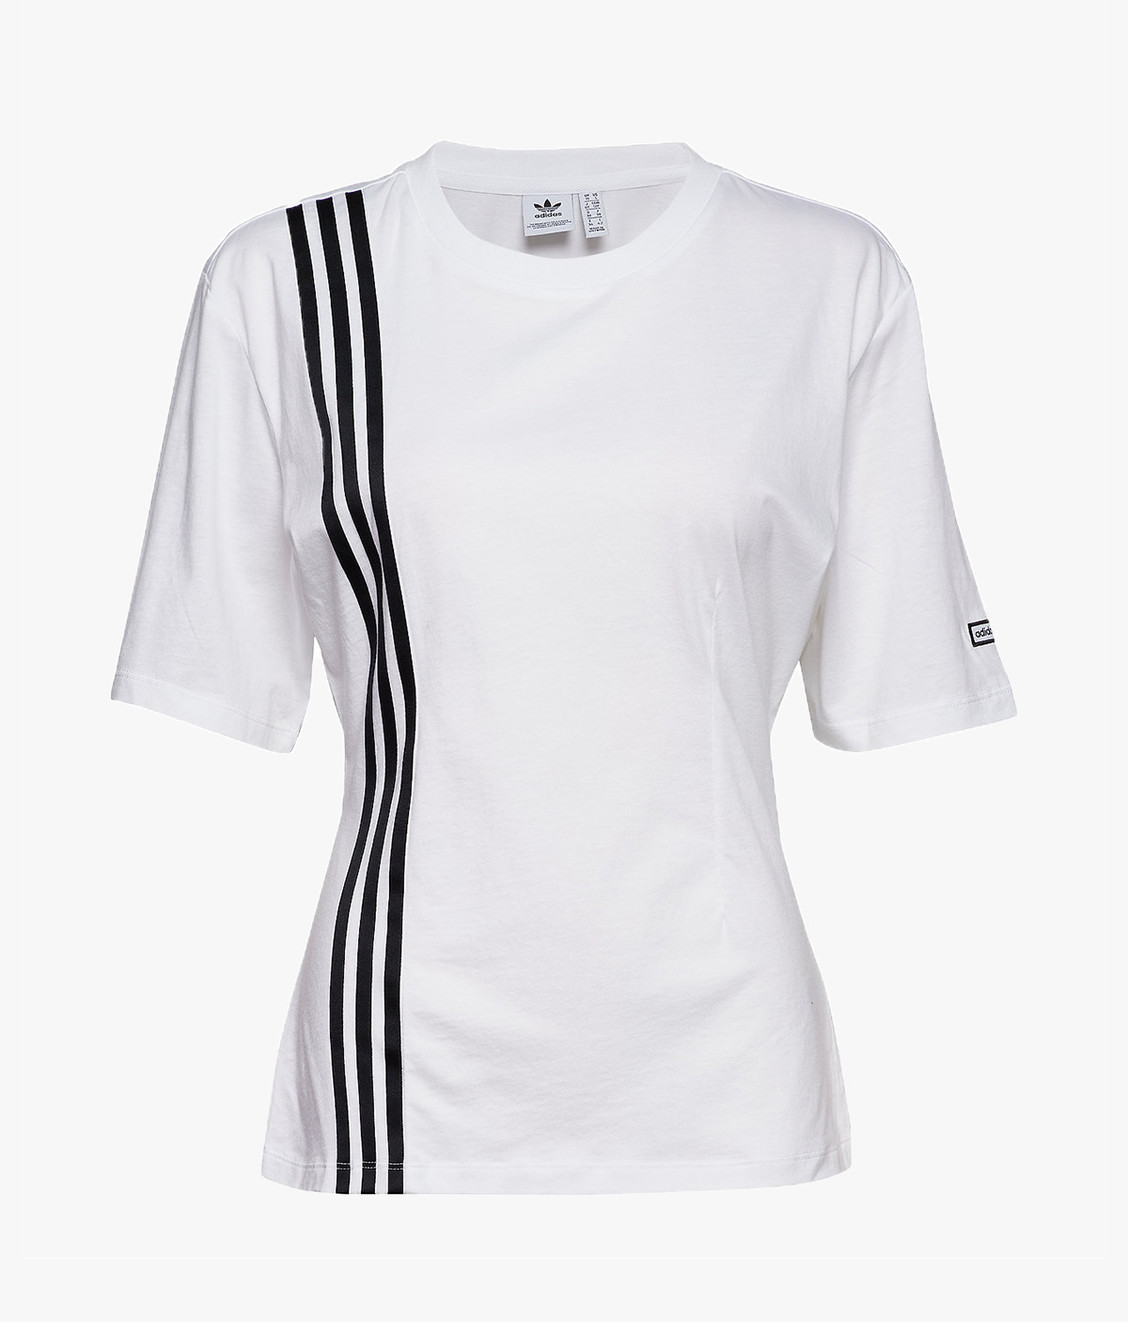 Adidas Adidas TLRD Tee White